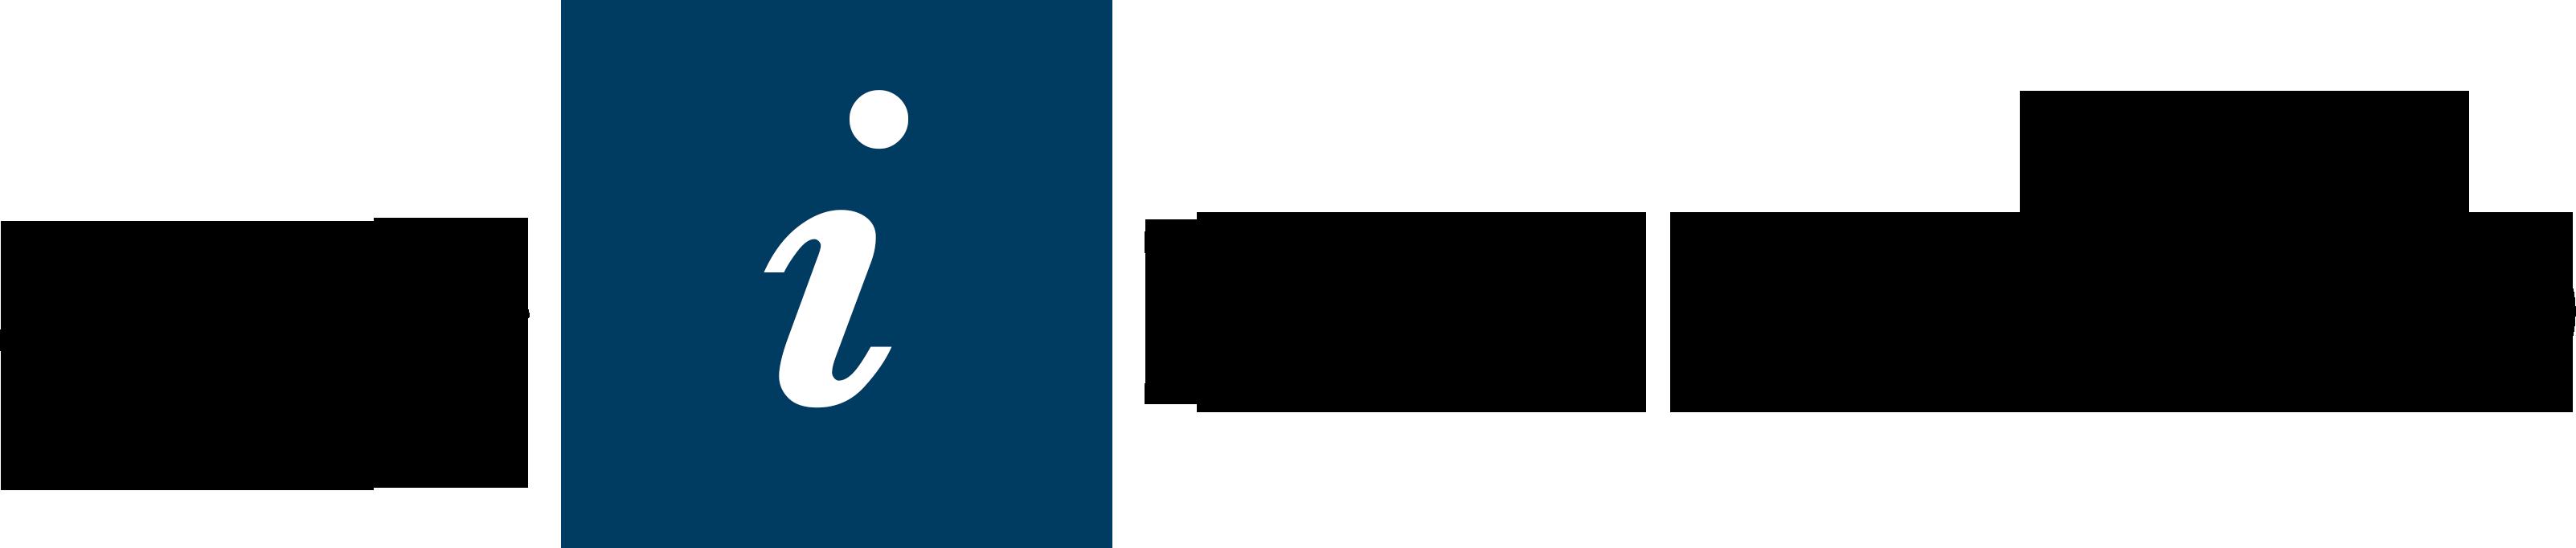 logo-myInvenio-hd-1